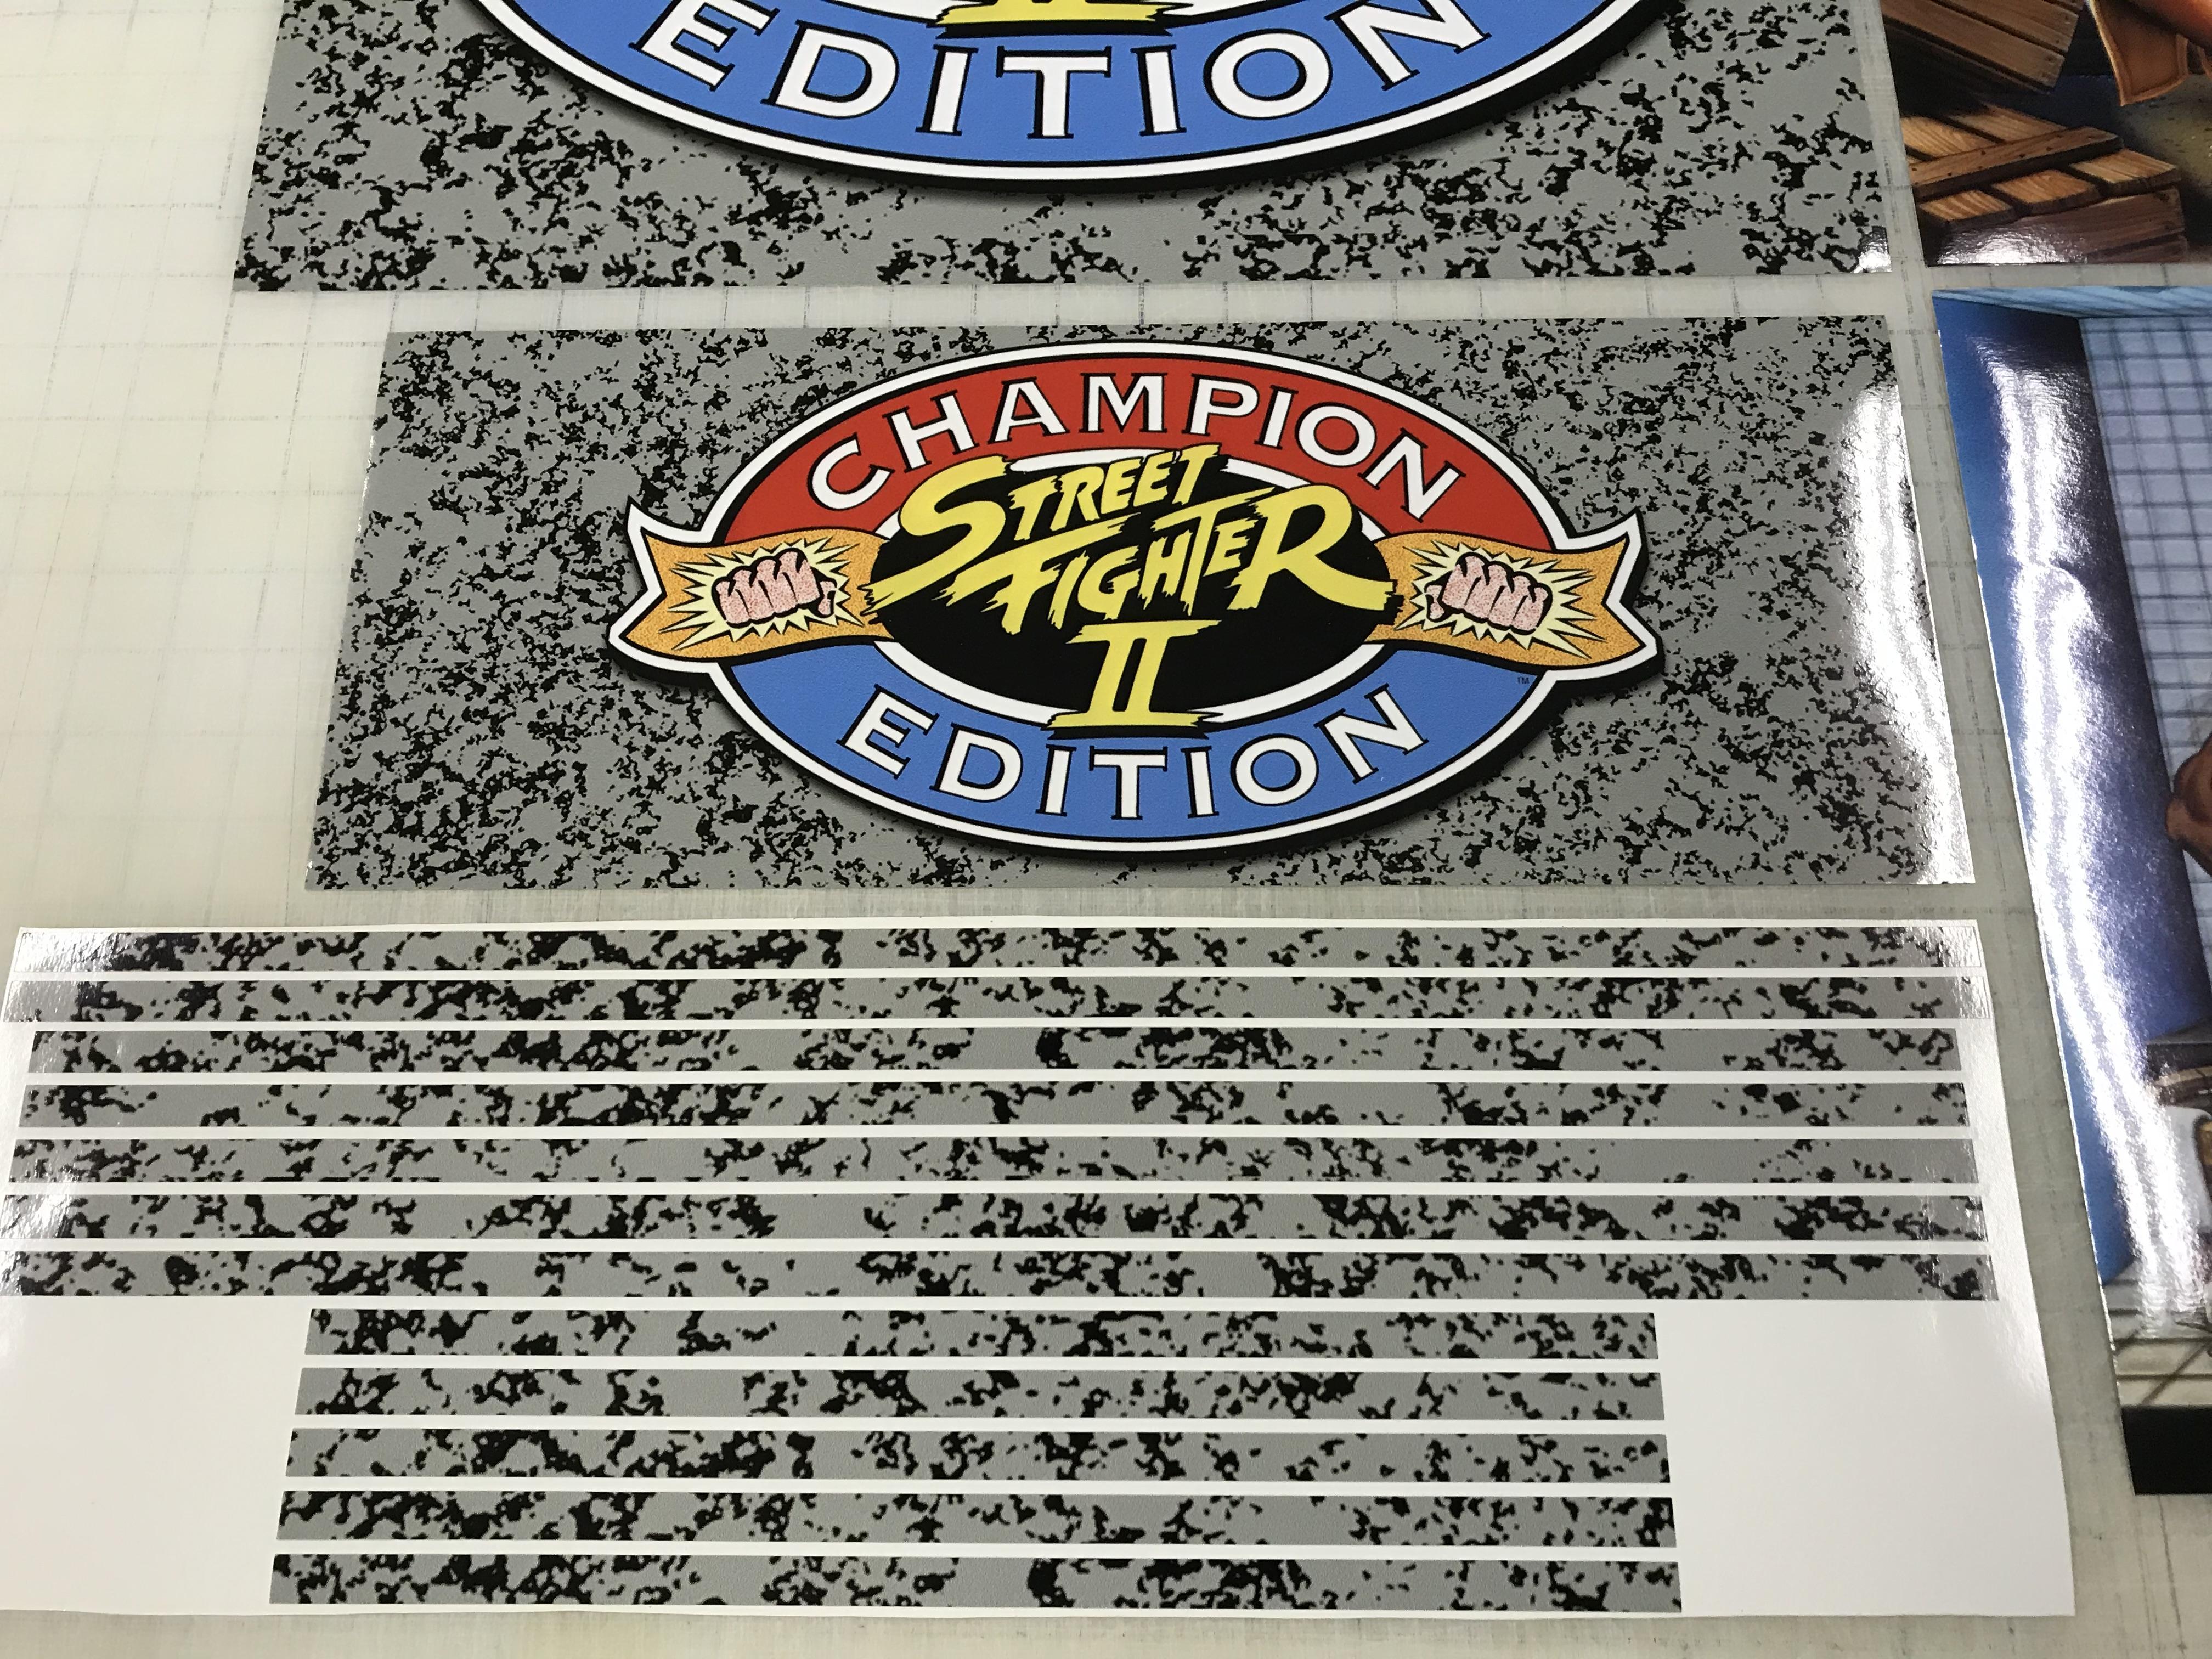 Arcade 1up Street Fighter Ii Champion Edition Riser Decals